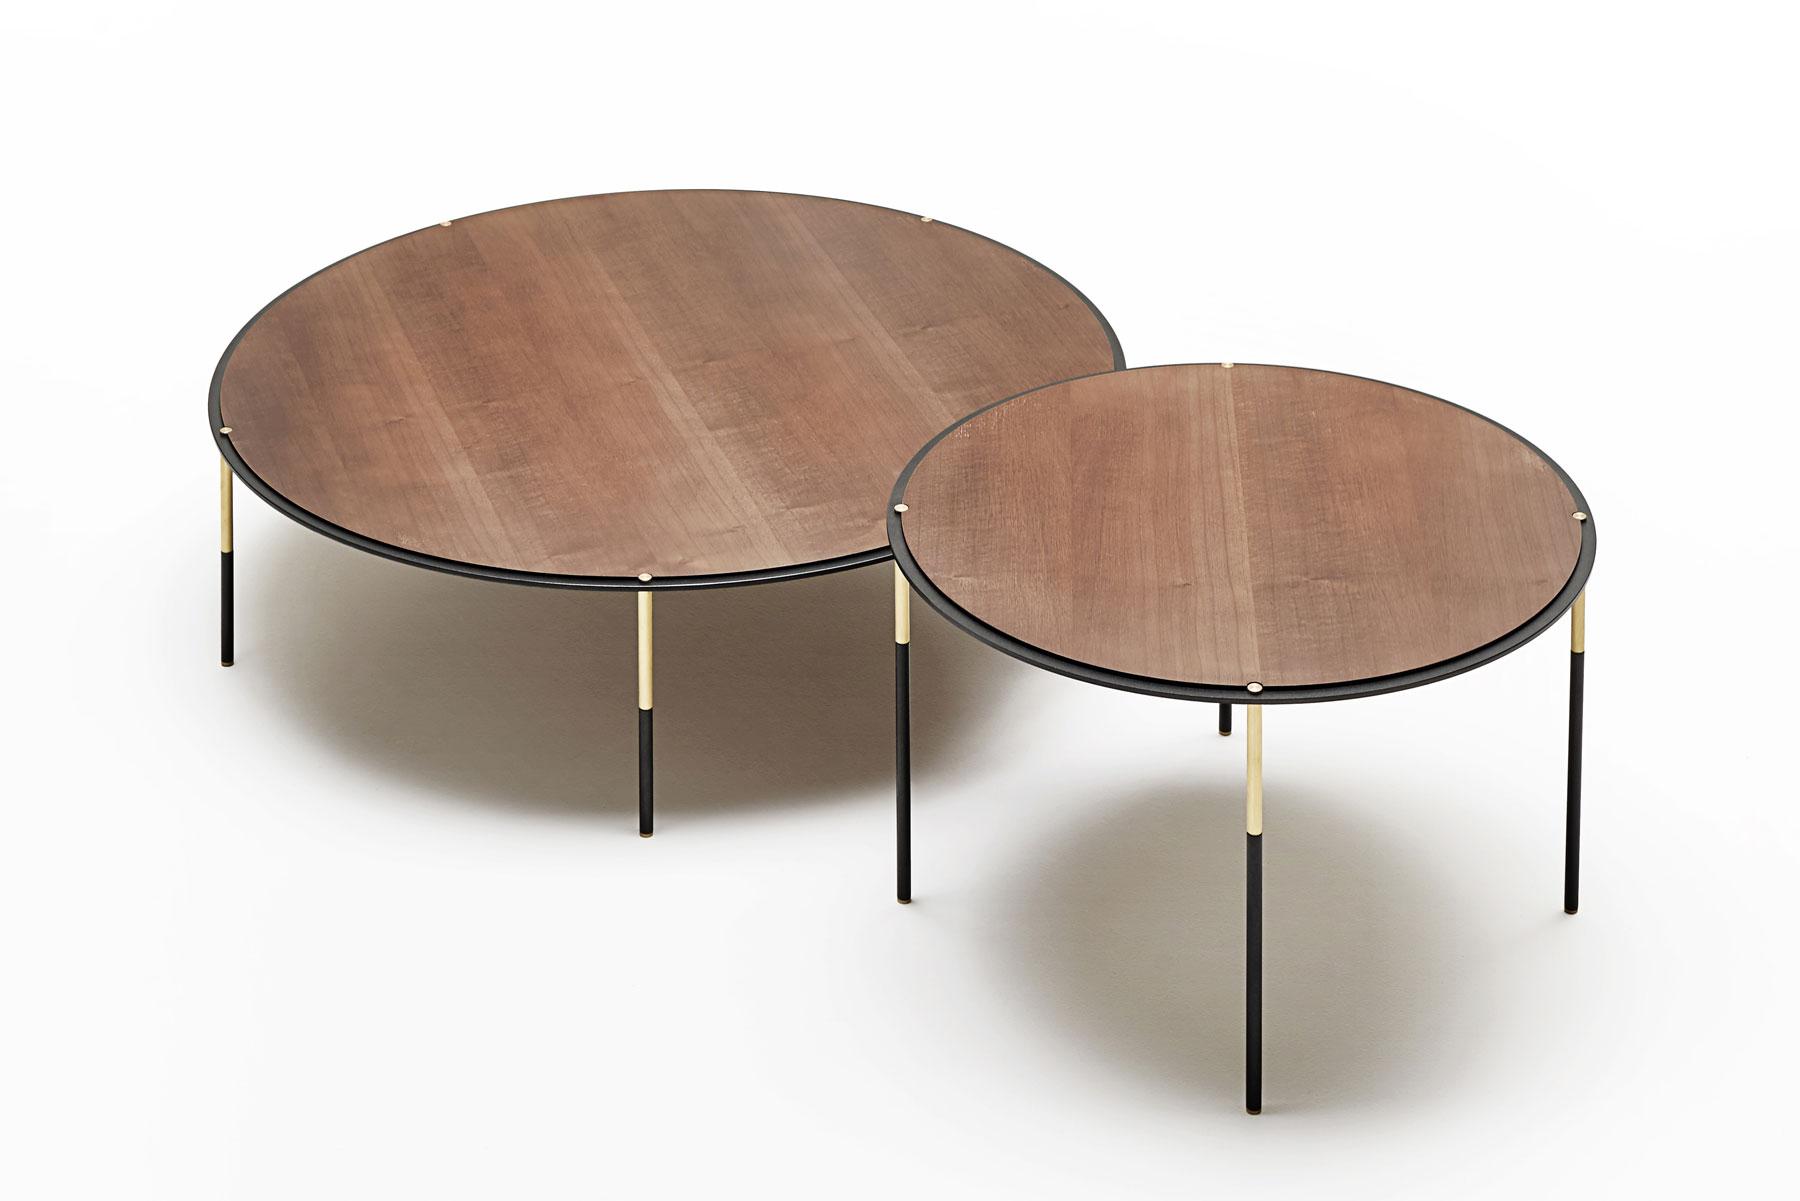 Era Table by Living Divani at Salone del Mobile 2017 | Yellowtrace